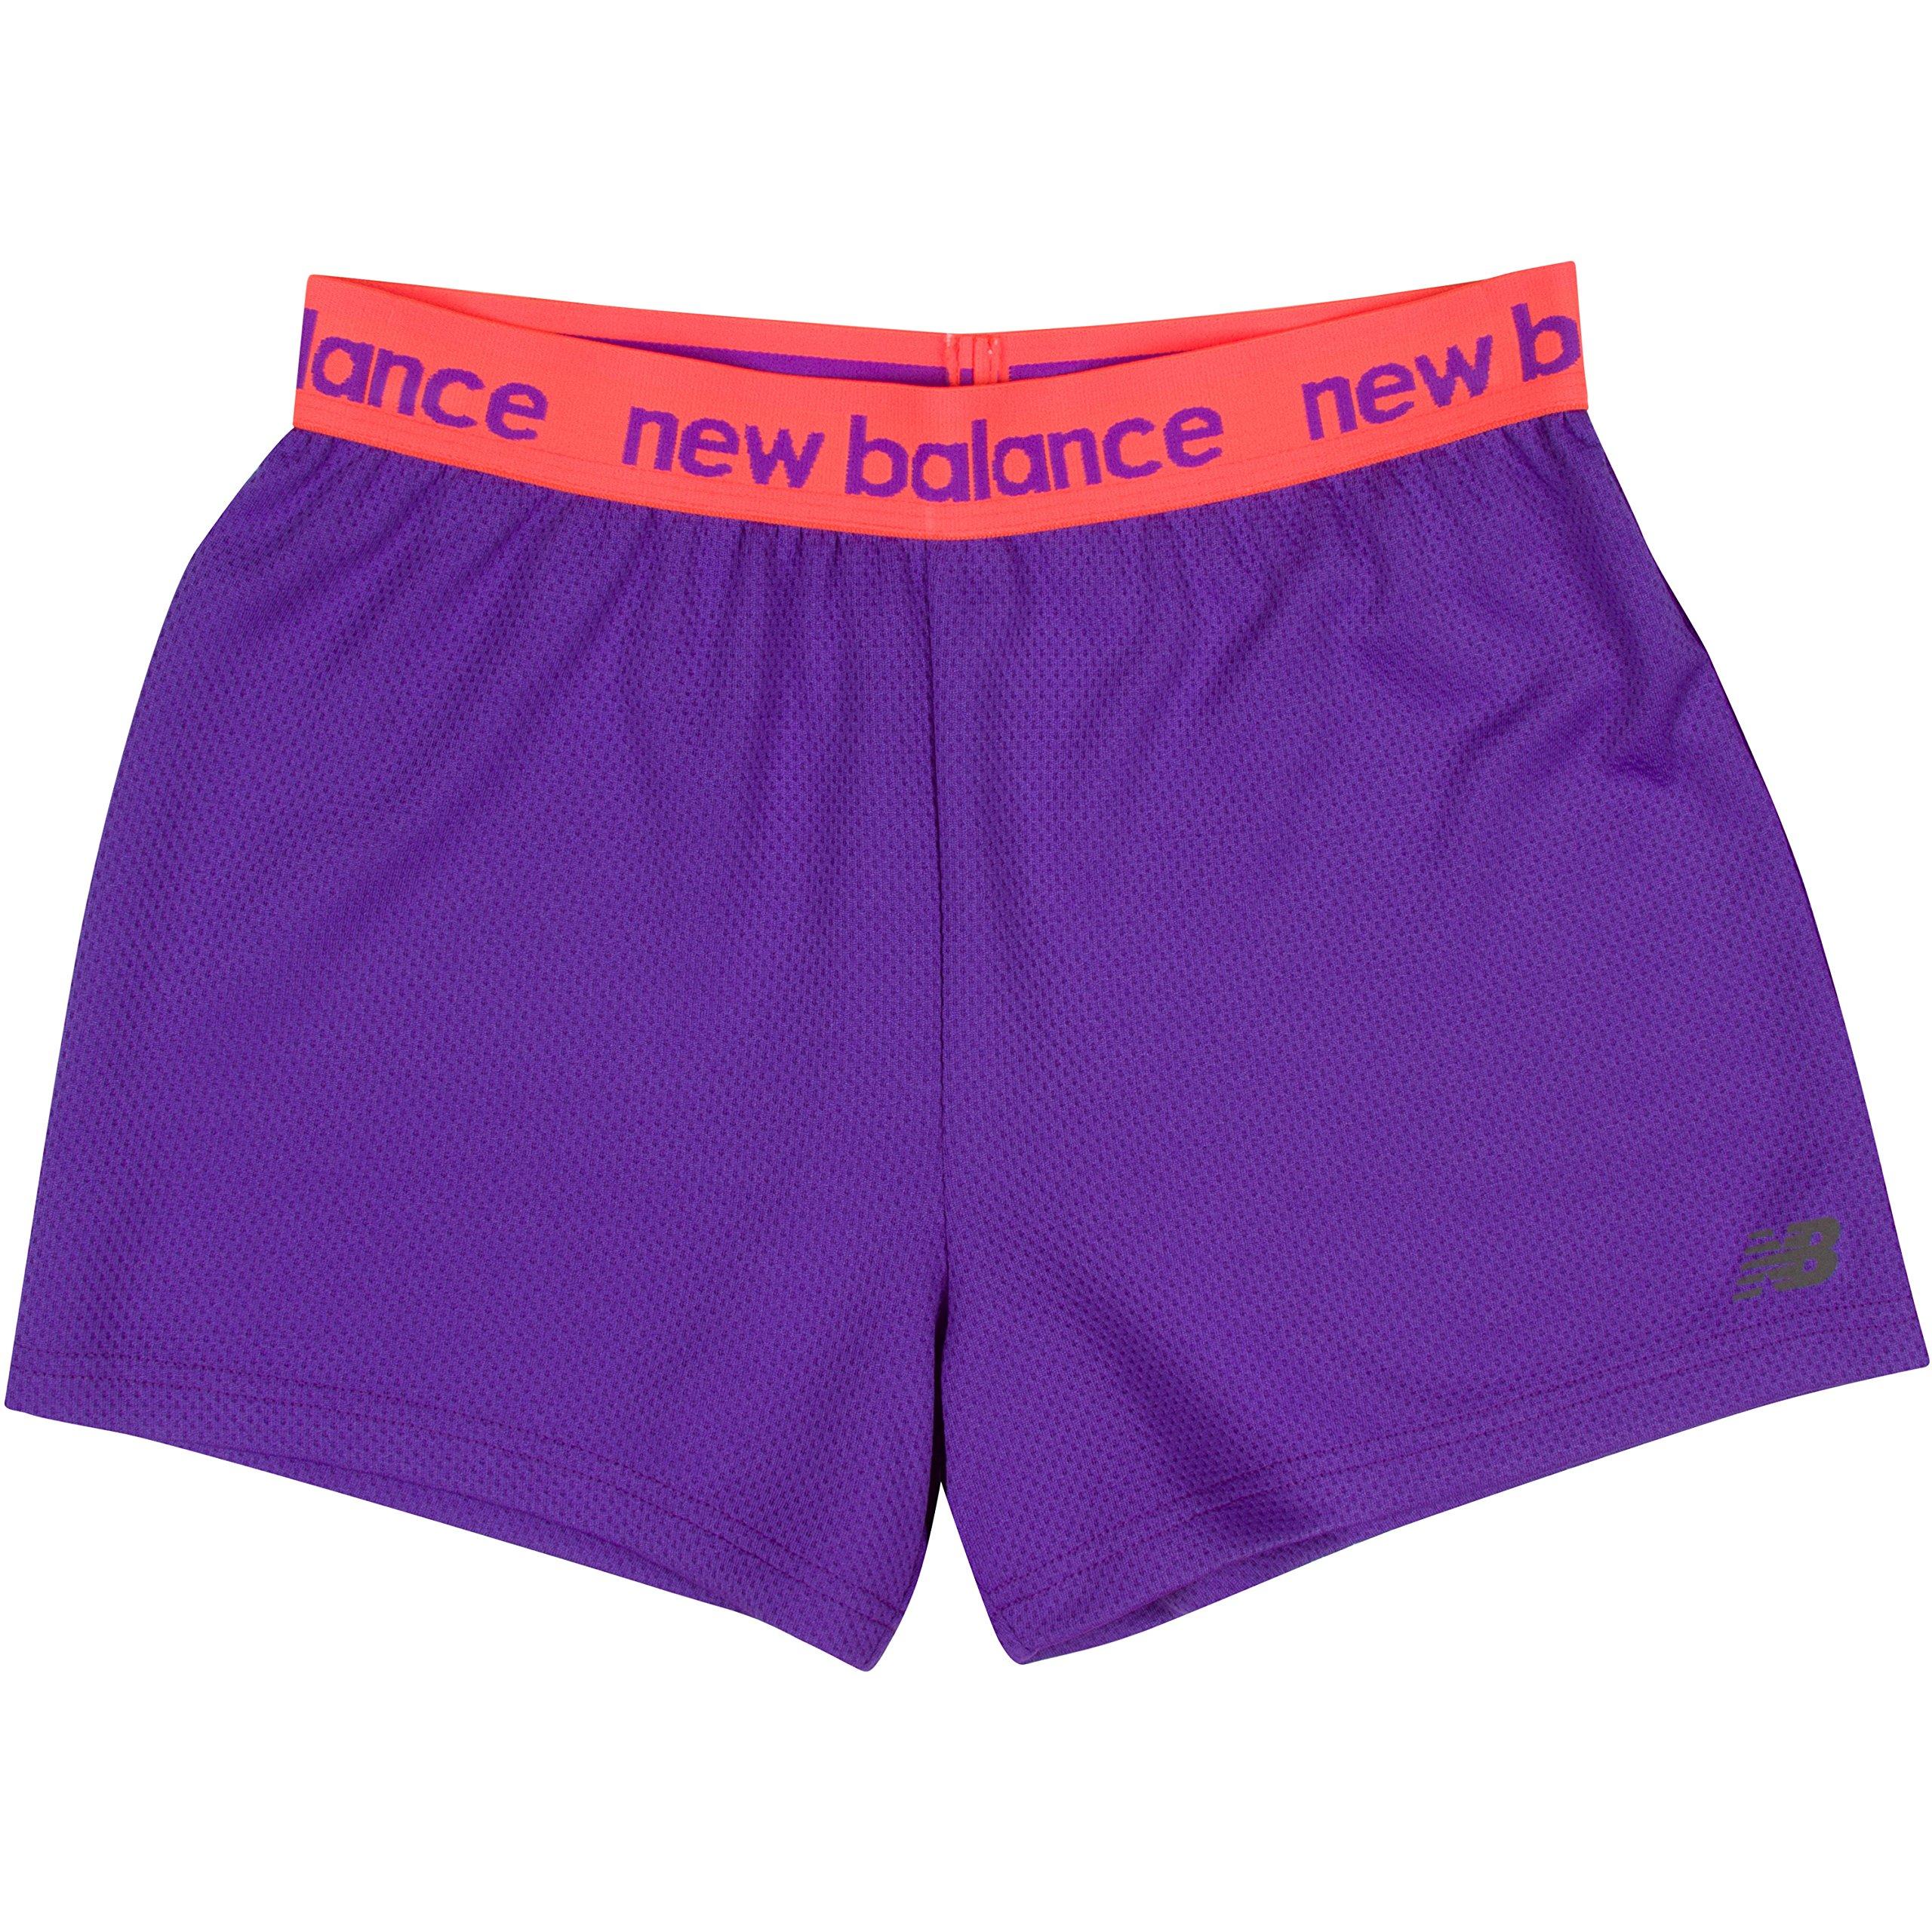 New Balance Big Girls' Athletic Shorts, Violet, 16